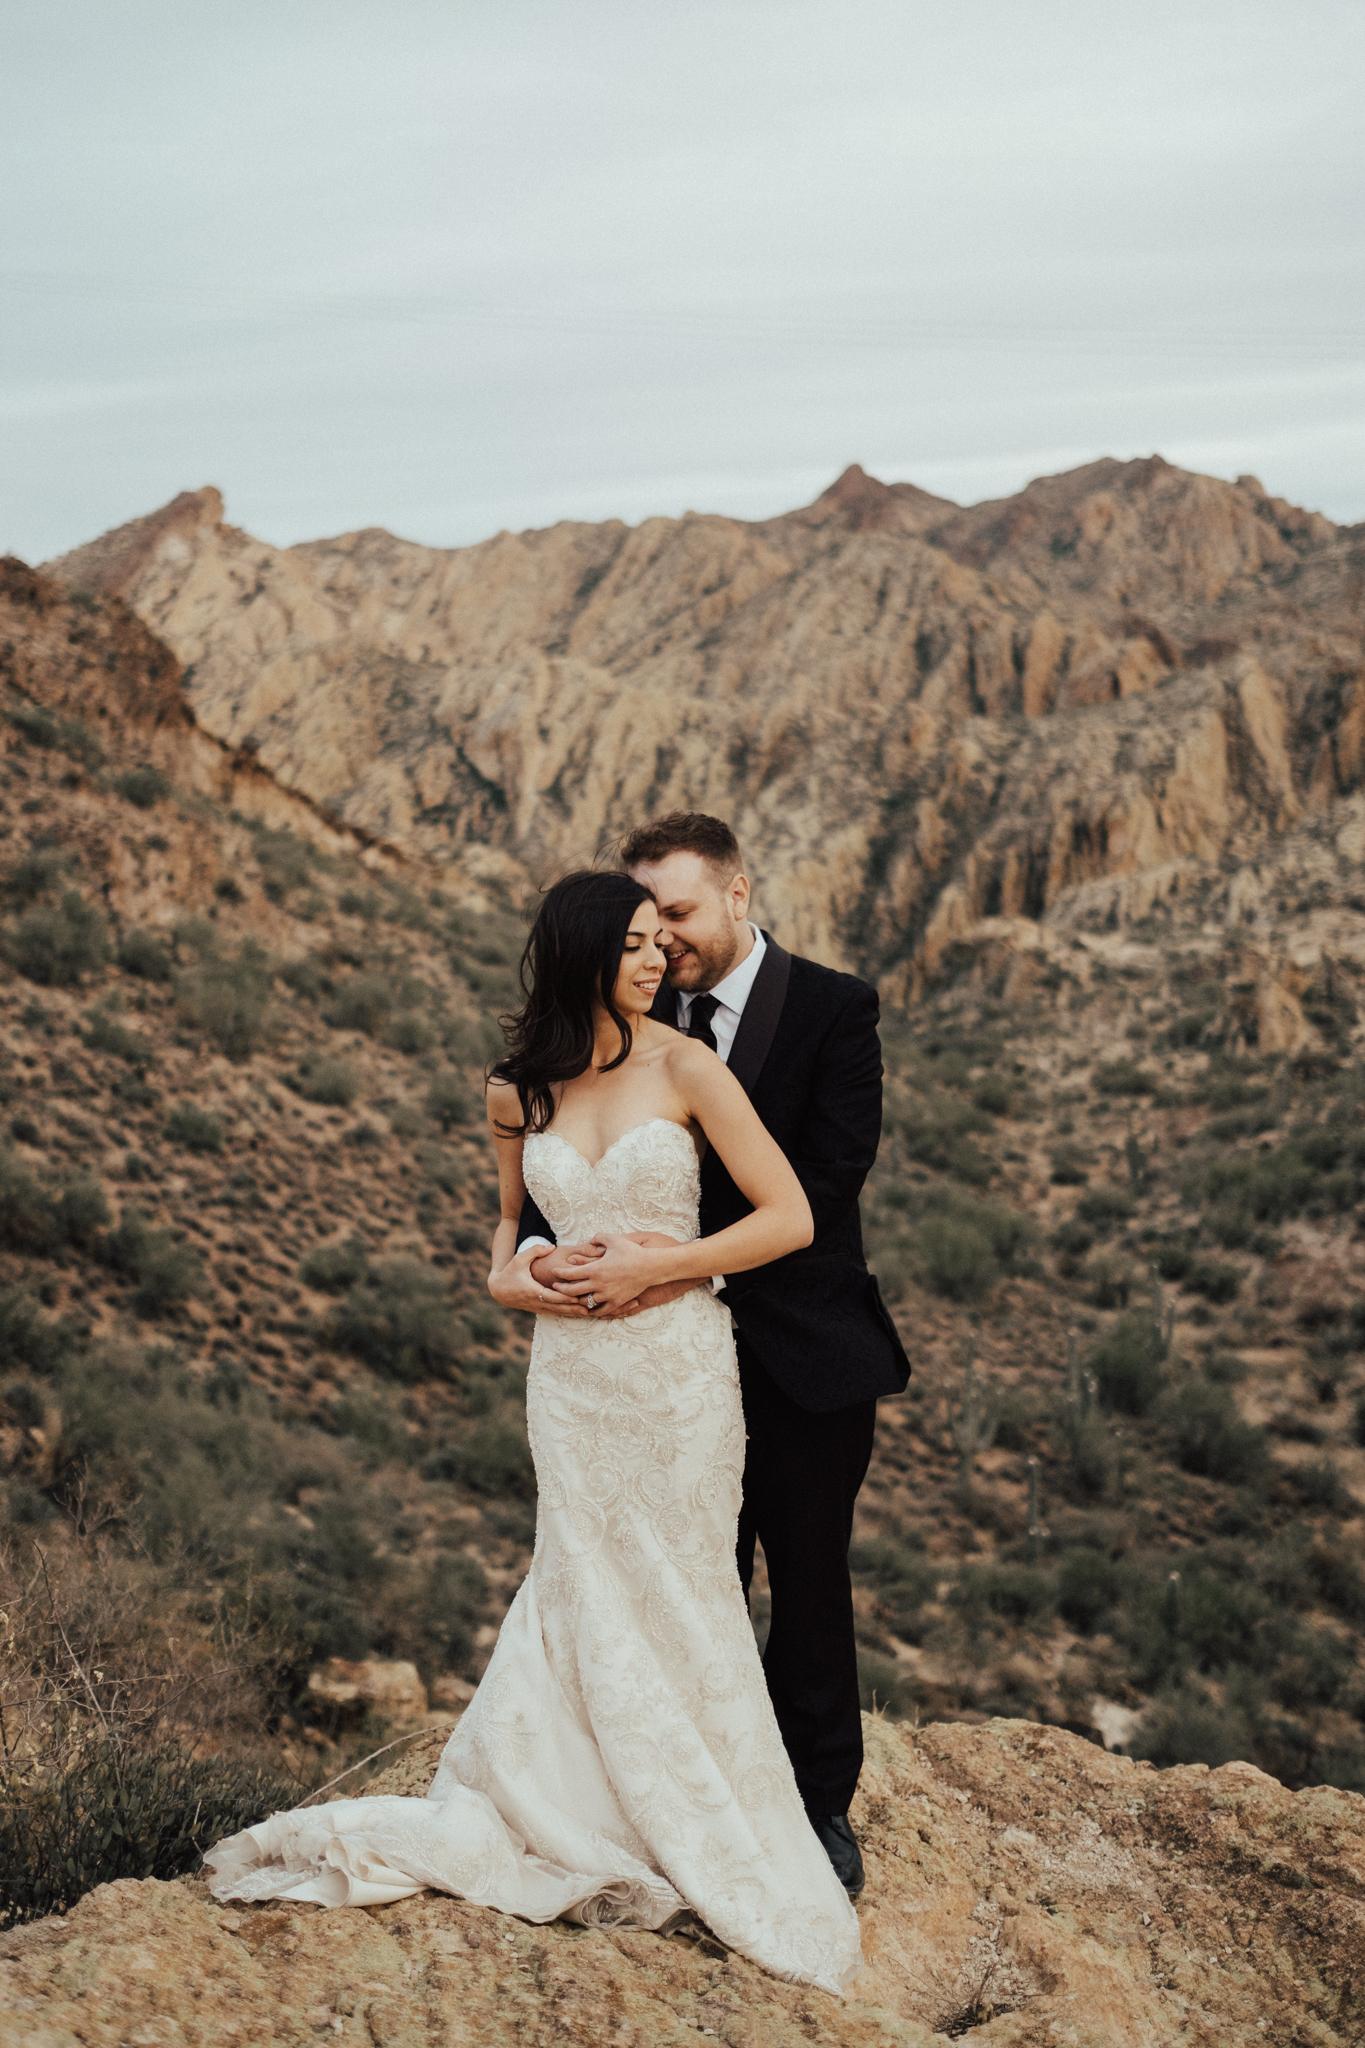 Arizona-Adventure-Elopement-Wedding-Photographer-56.jpg